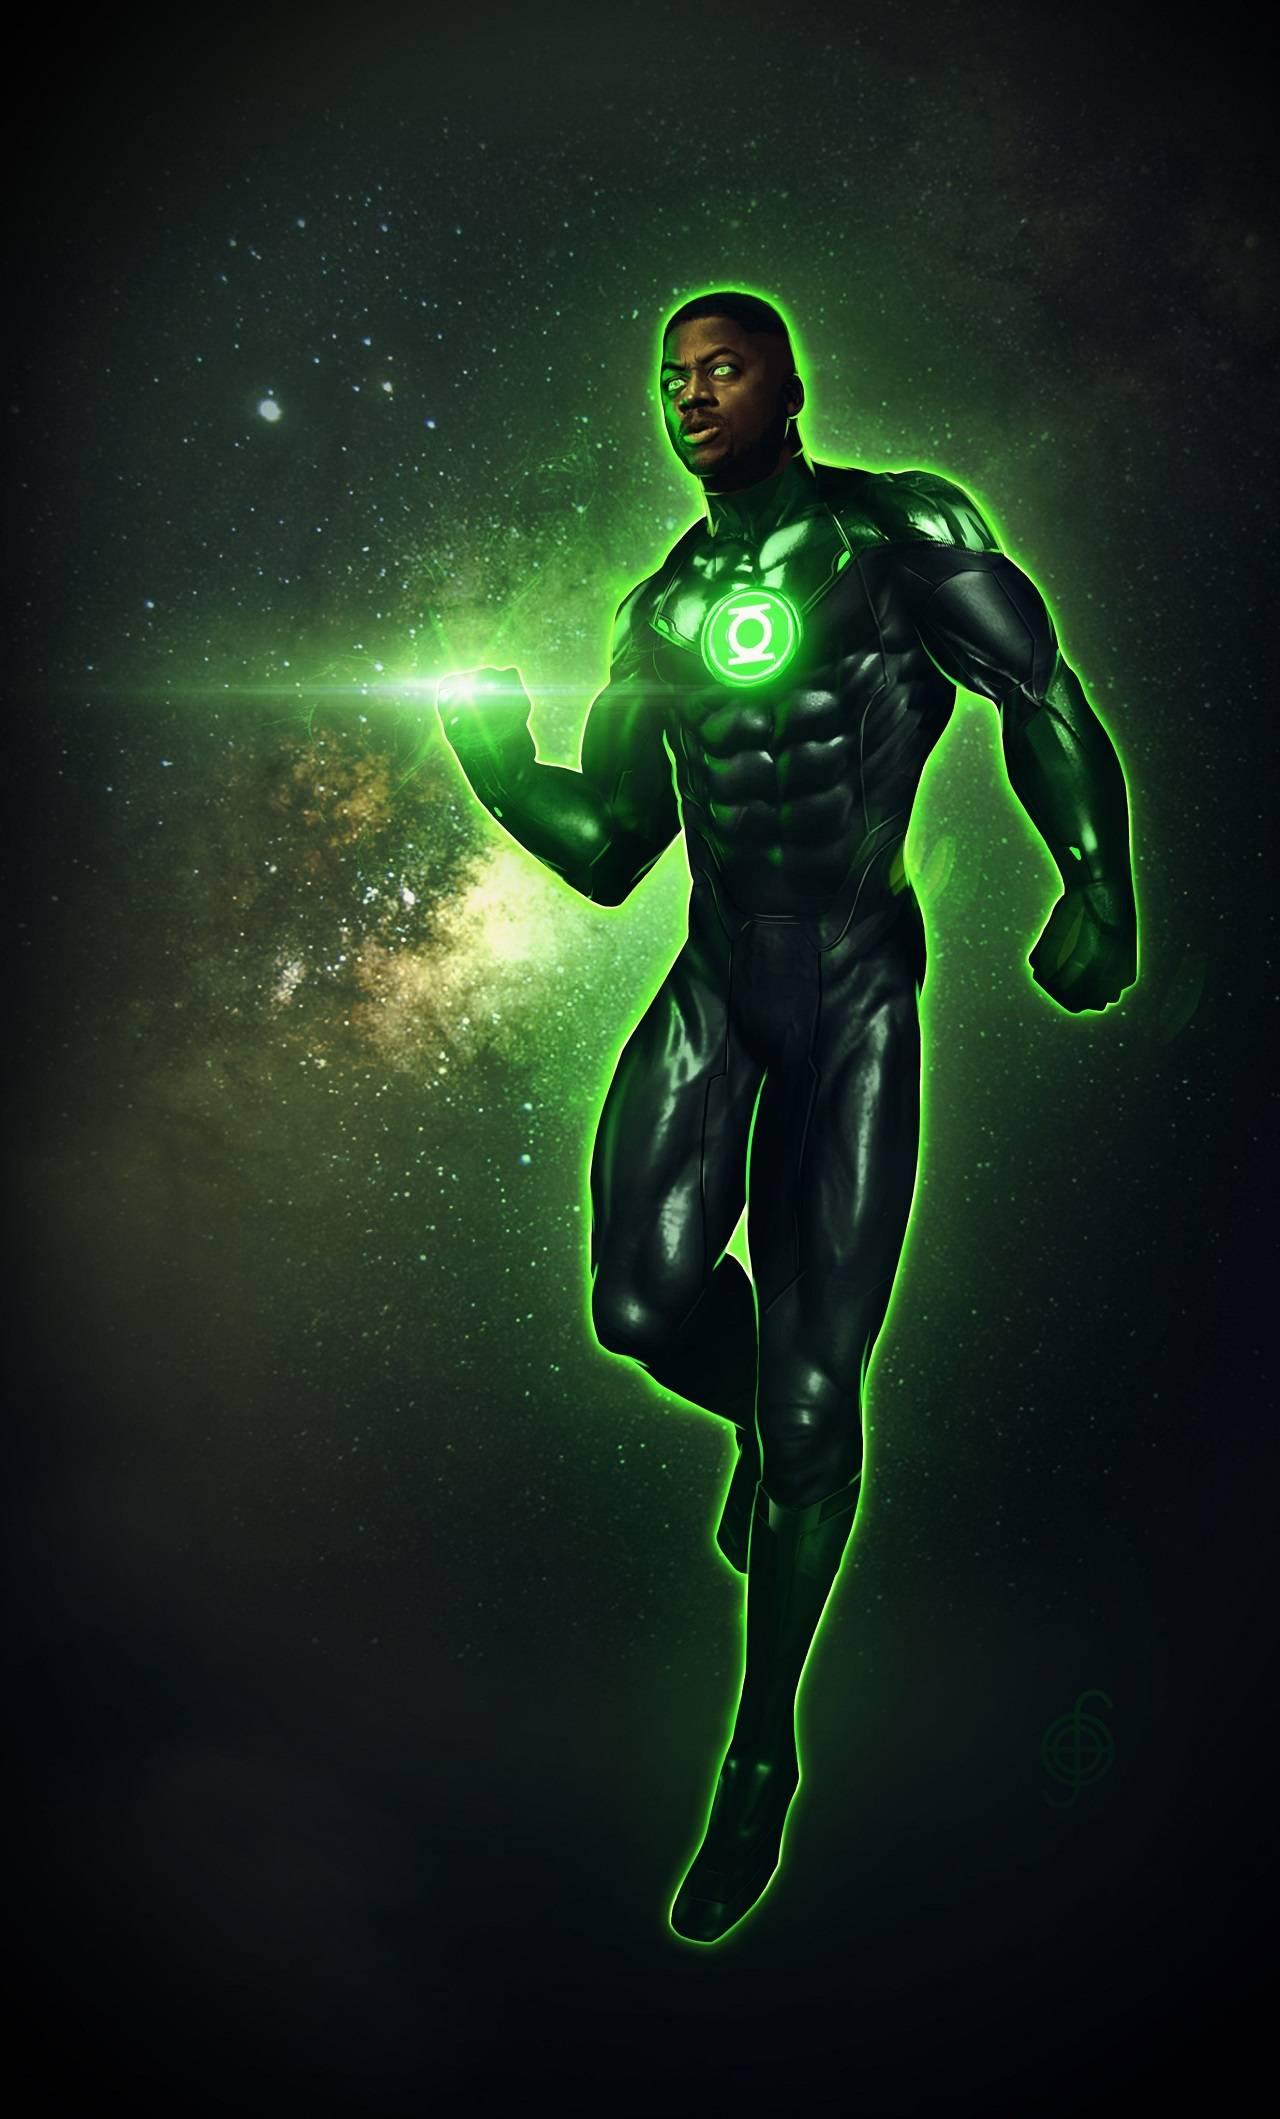 Green Lantern Jon Stewart Justice League Snyder Cut DC Comics